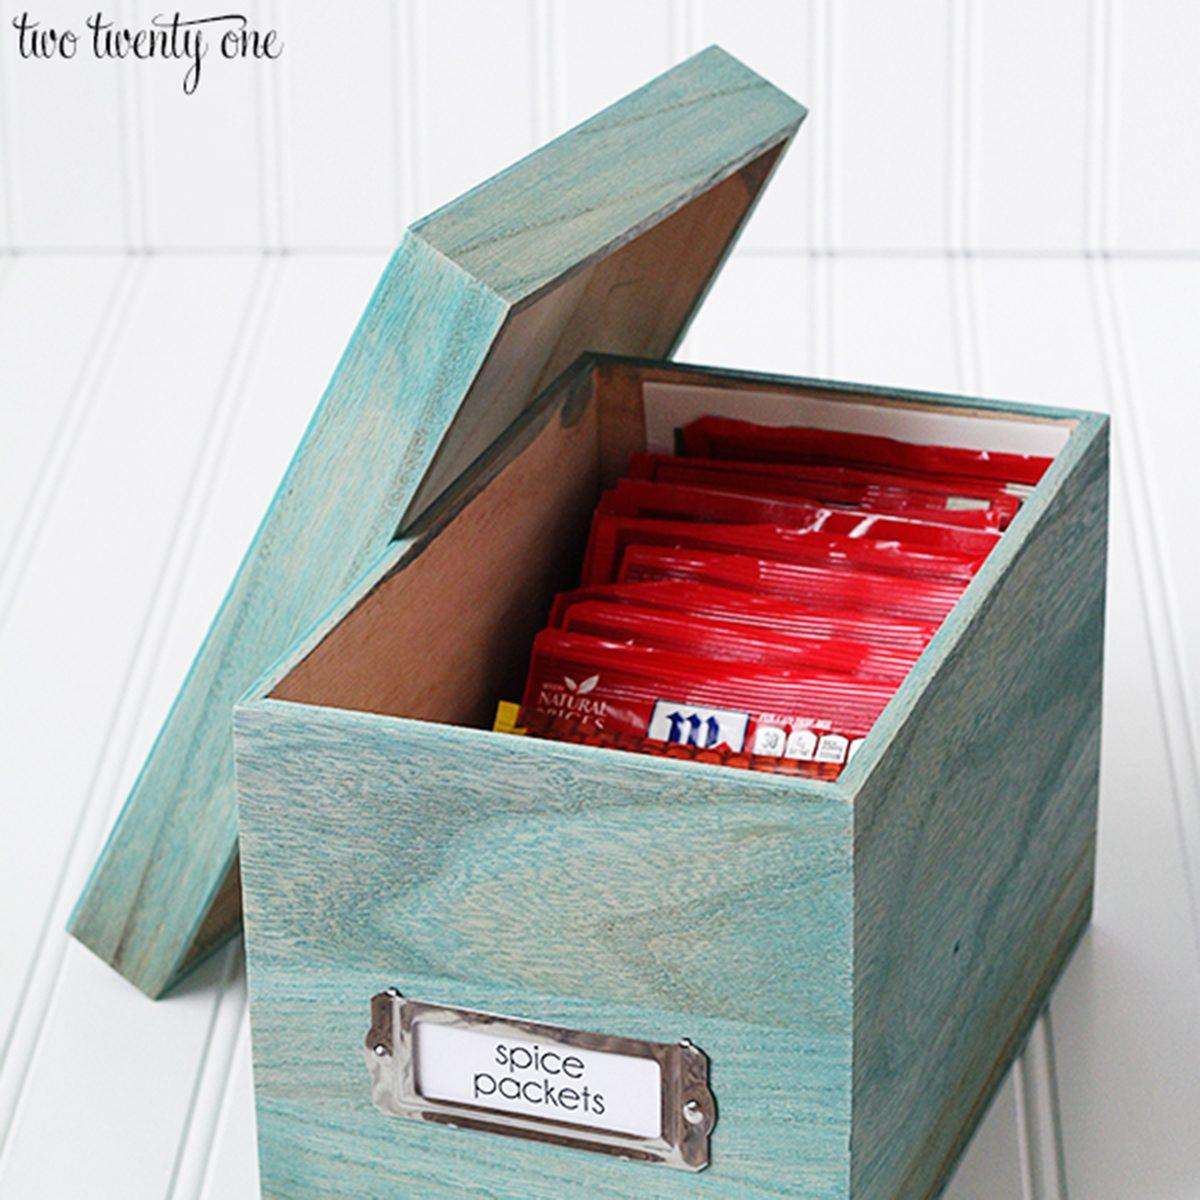 Spice packet organization box